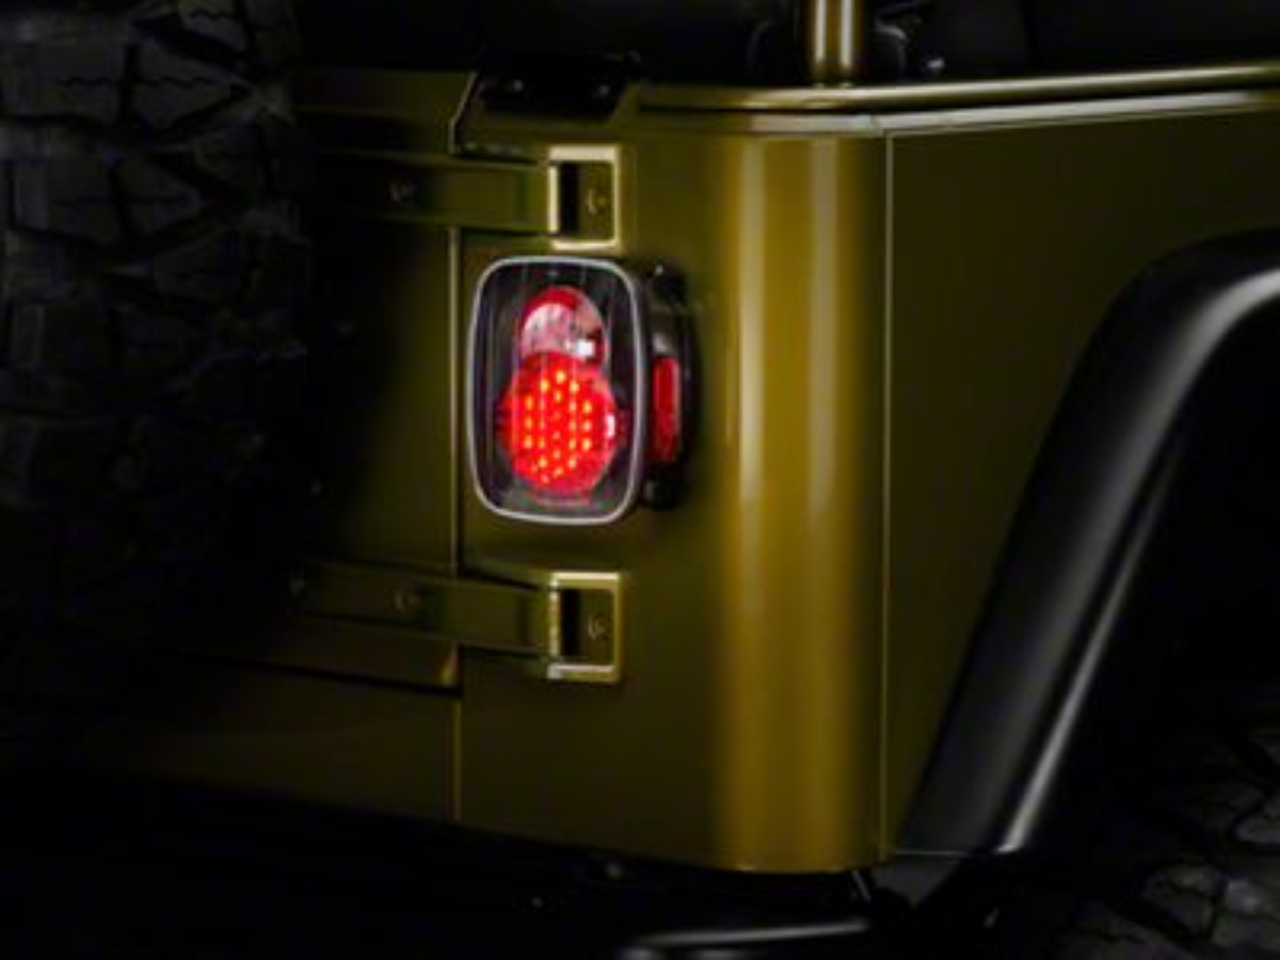 Axial LED Tail Lights - Bermuda Black (87-06 Jeep Wrangler YJ, TJ)